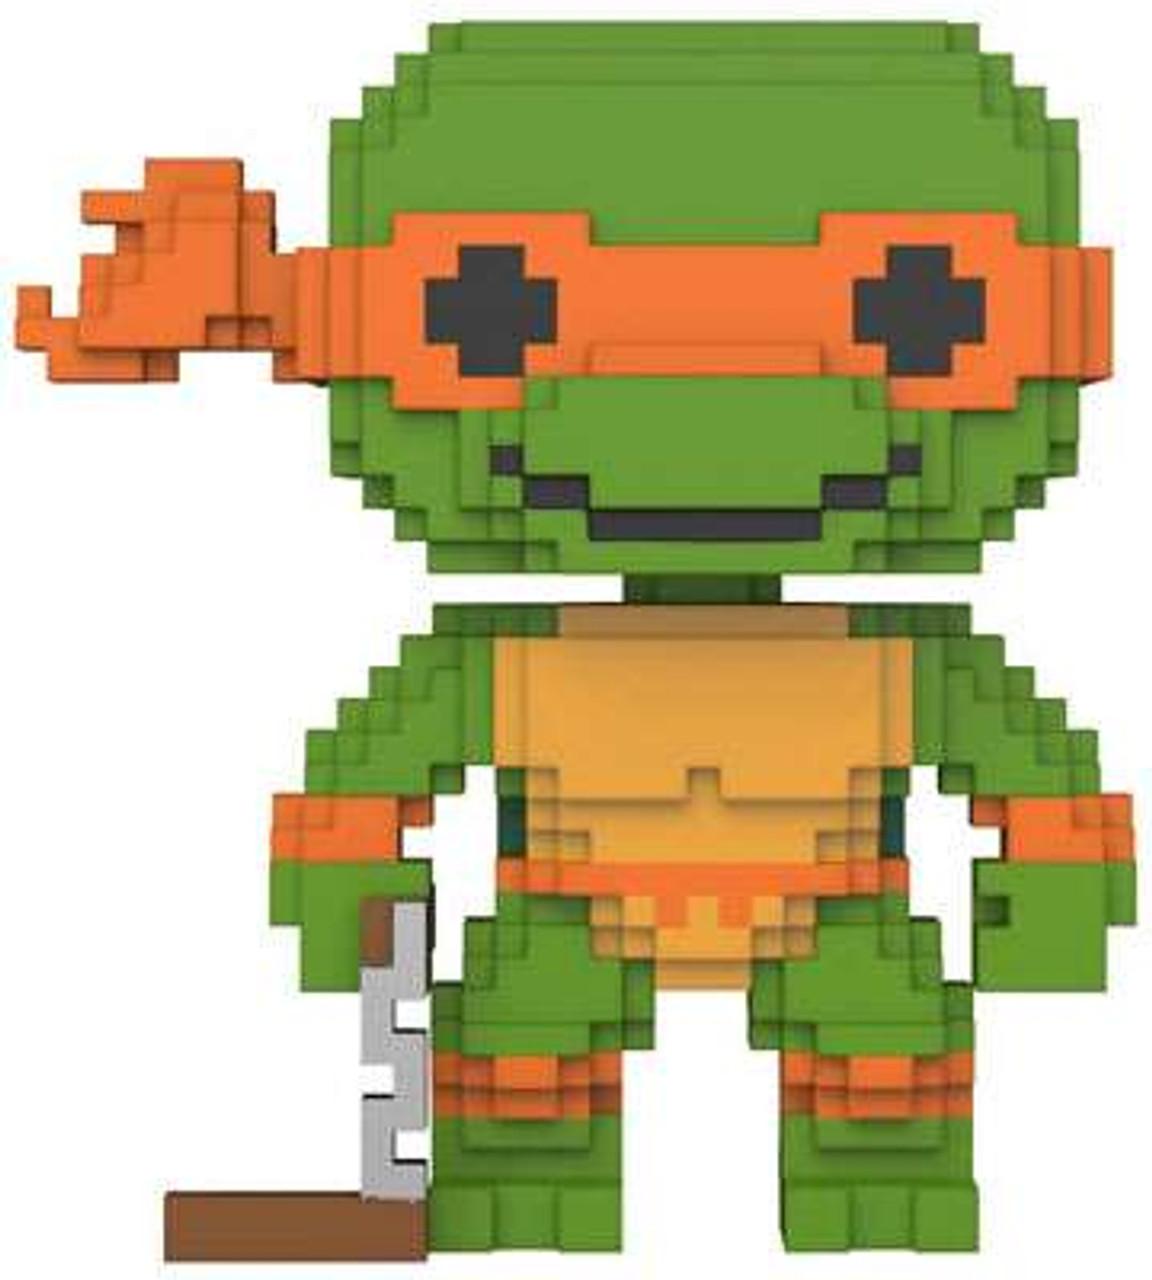 Funko 8-Bit Pop TMNT Teenage Mutant Ninja Turtles Michelangelo  Figure MIKEY #07